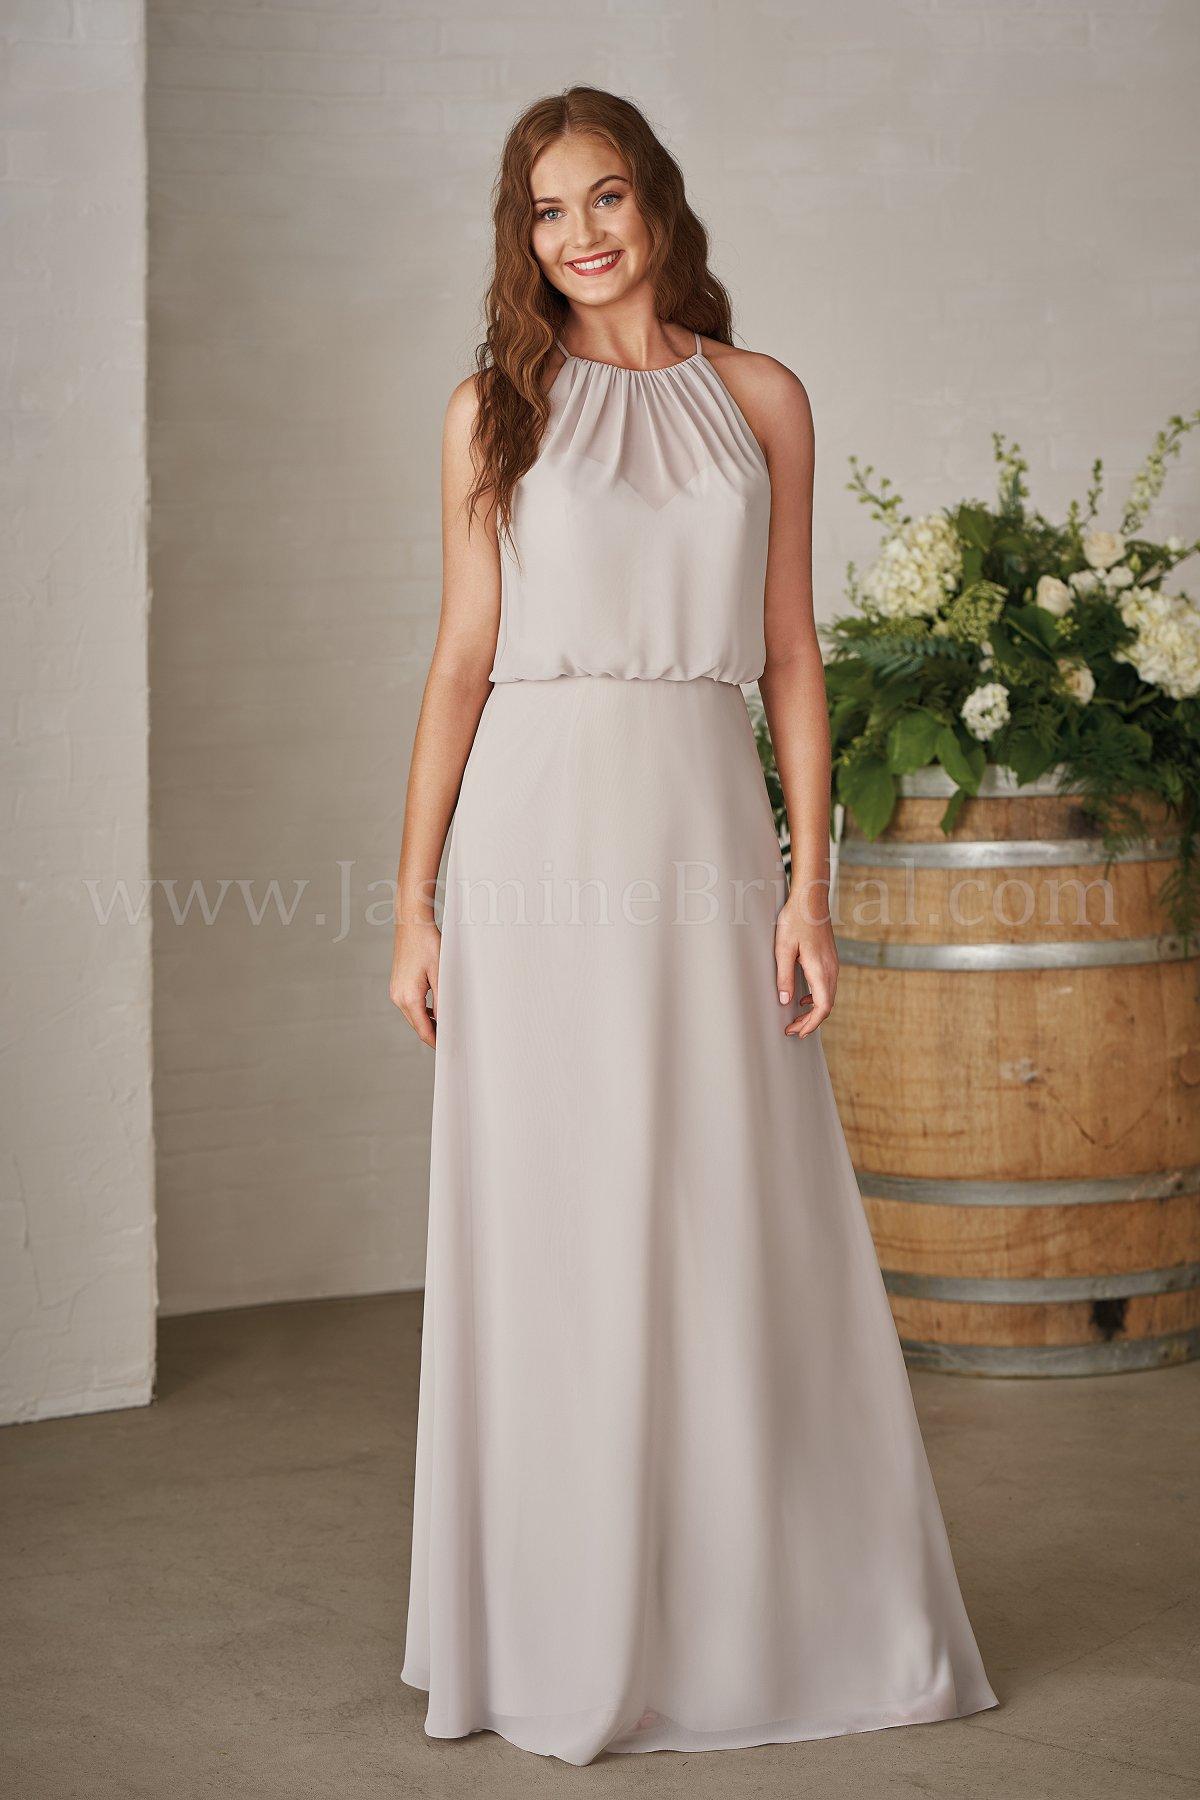 2019 year style- Dresses Bridesmaid